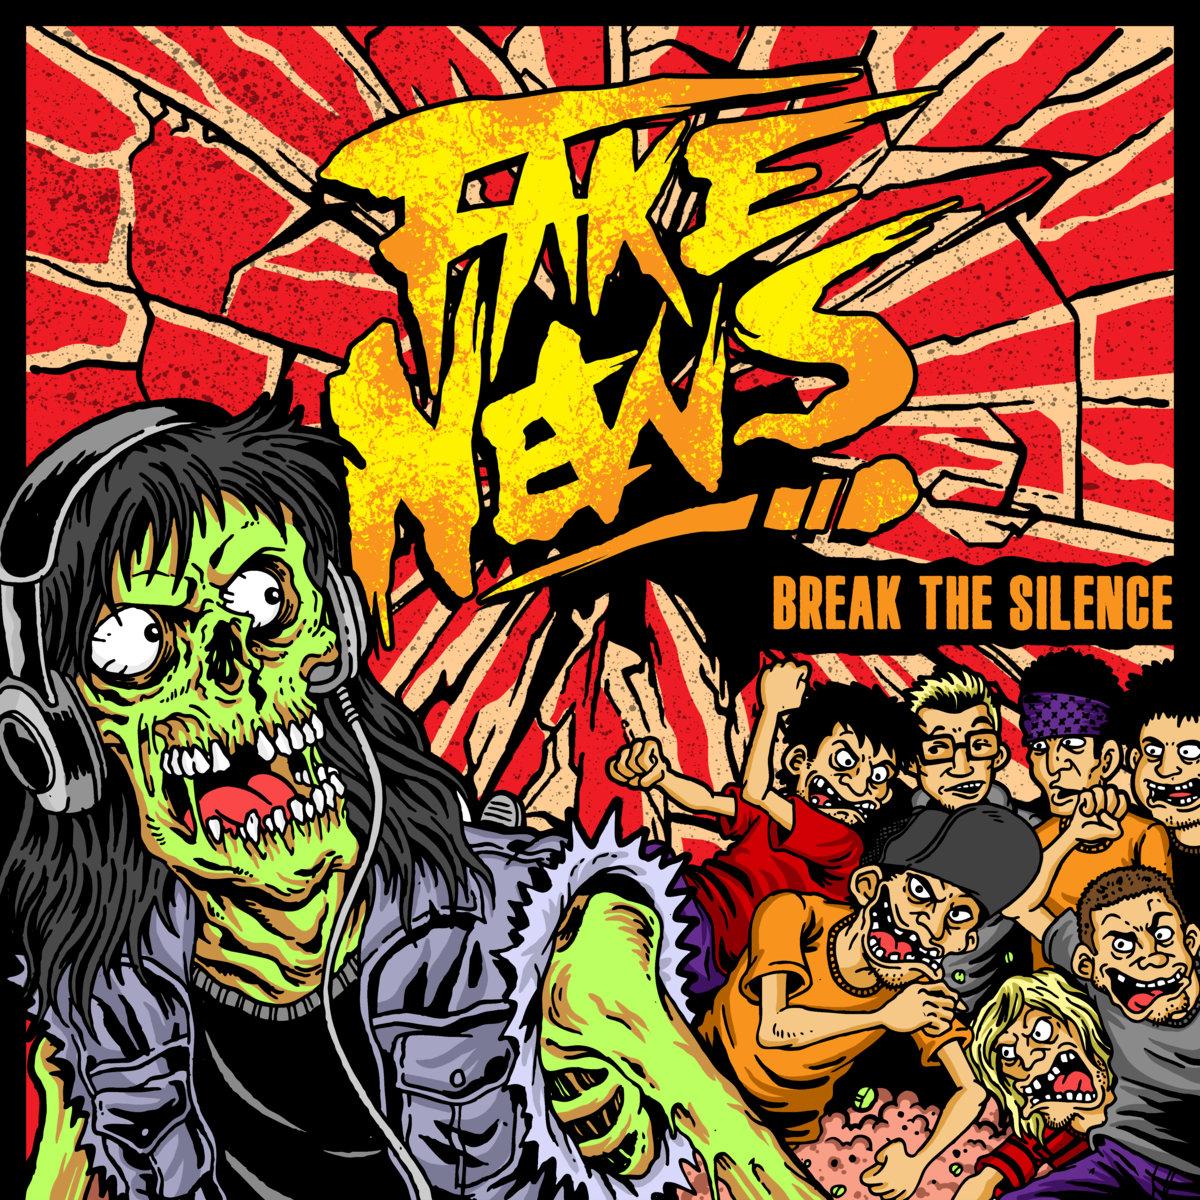 Fake News Break The Silence